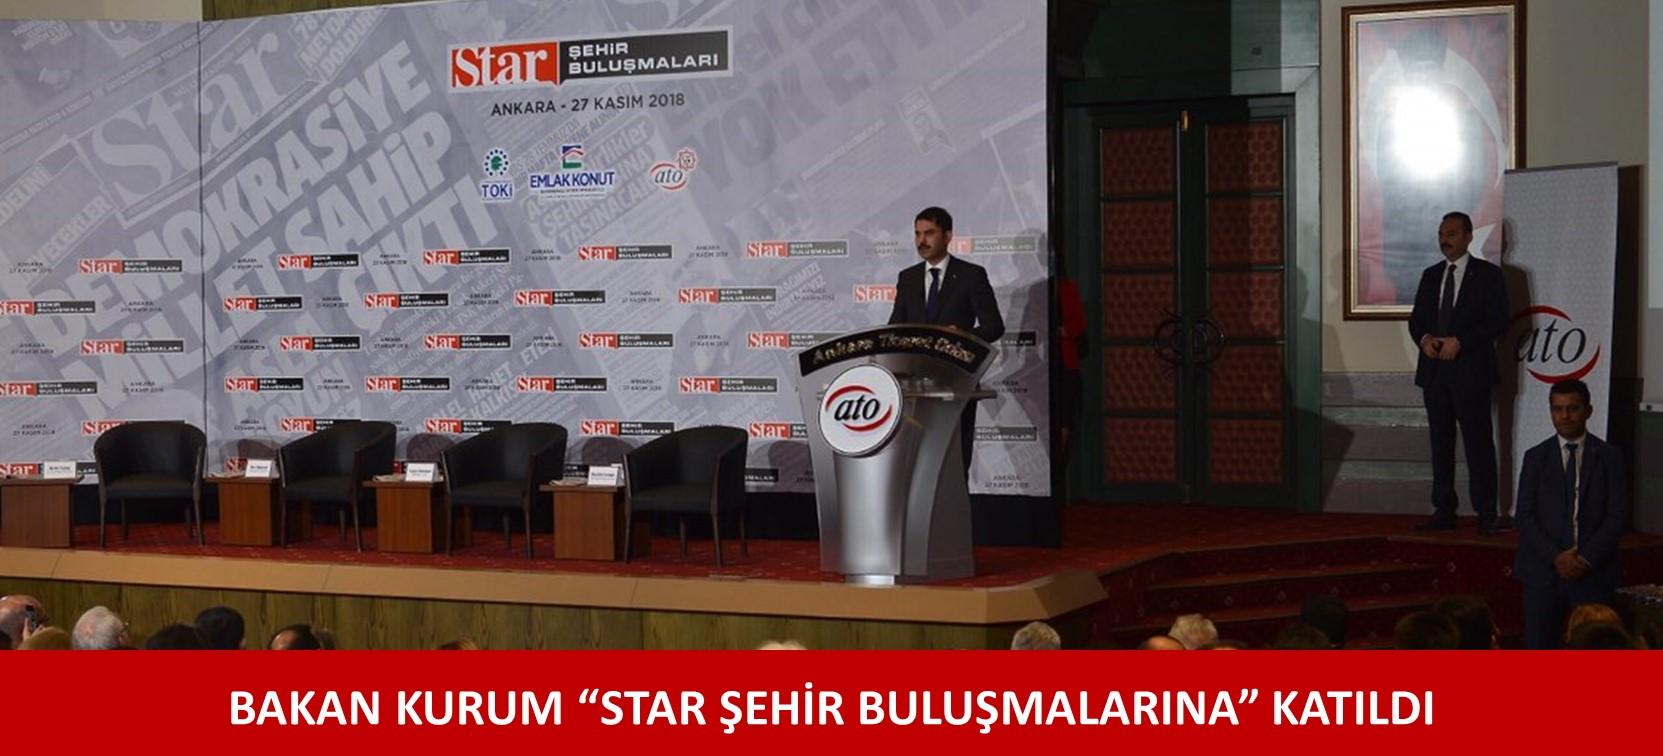 "BAKAN KURUM ""STAR ŞEHİR BULUŞMALARINA"" KATILDI"